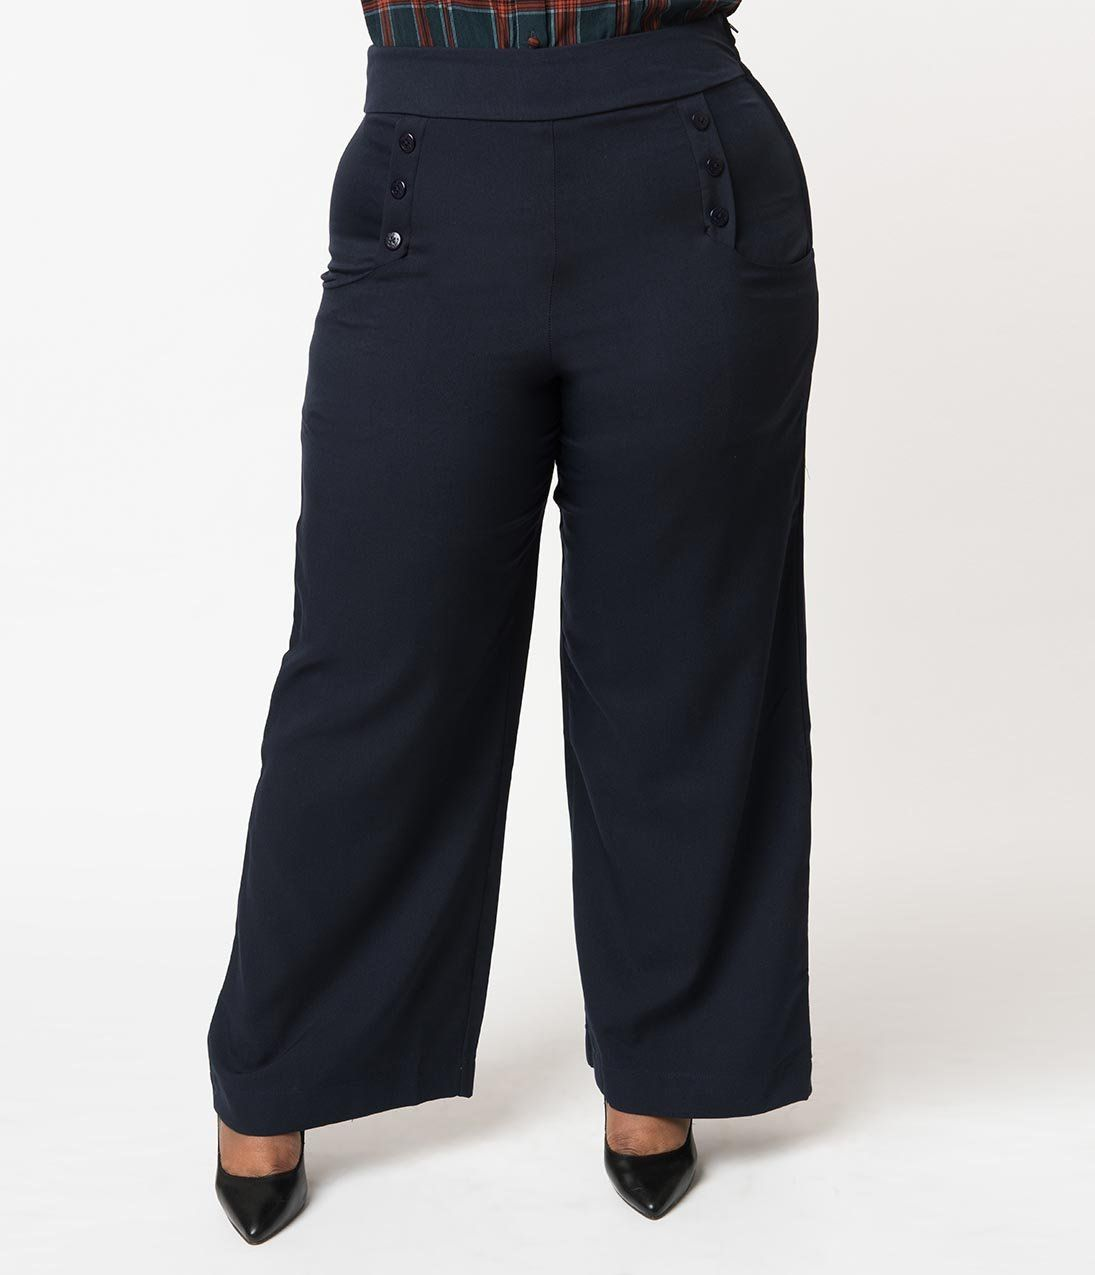 e68cbf2e9e883 Plus Size 1940s Style Moss Green High Waist Sailor Ginger Pants in ...